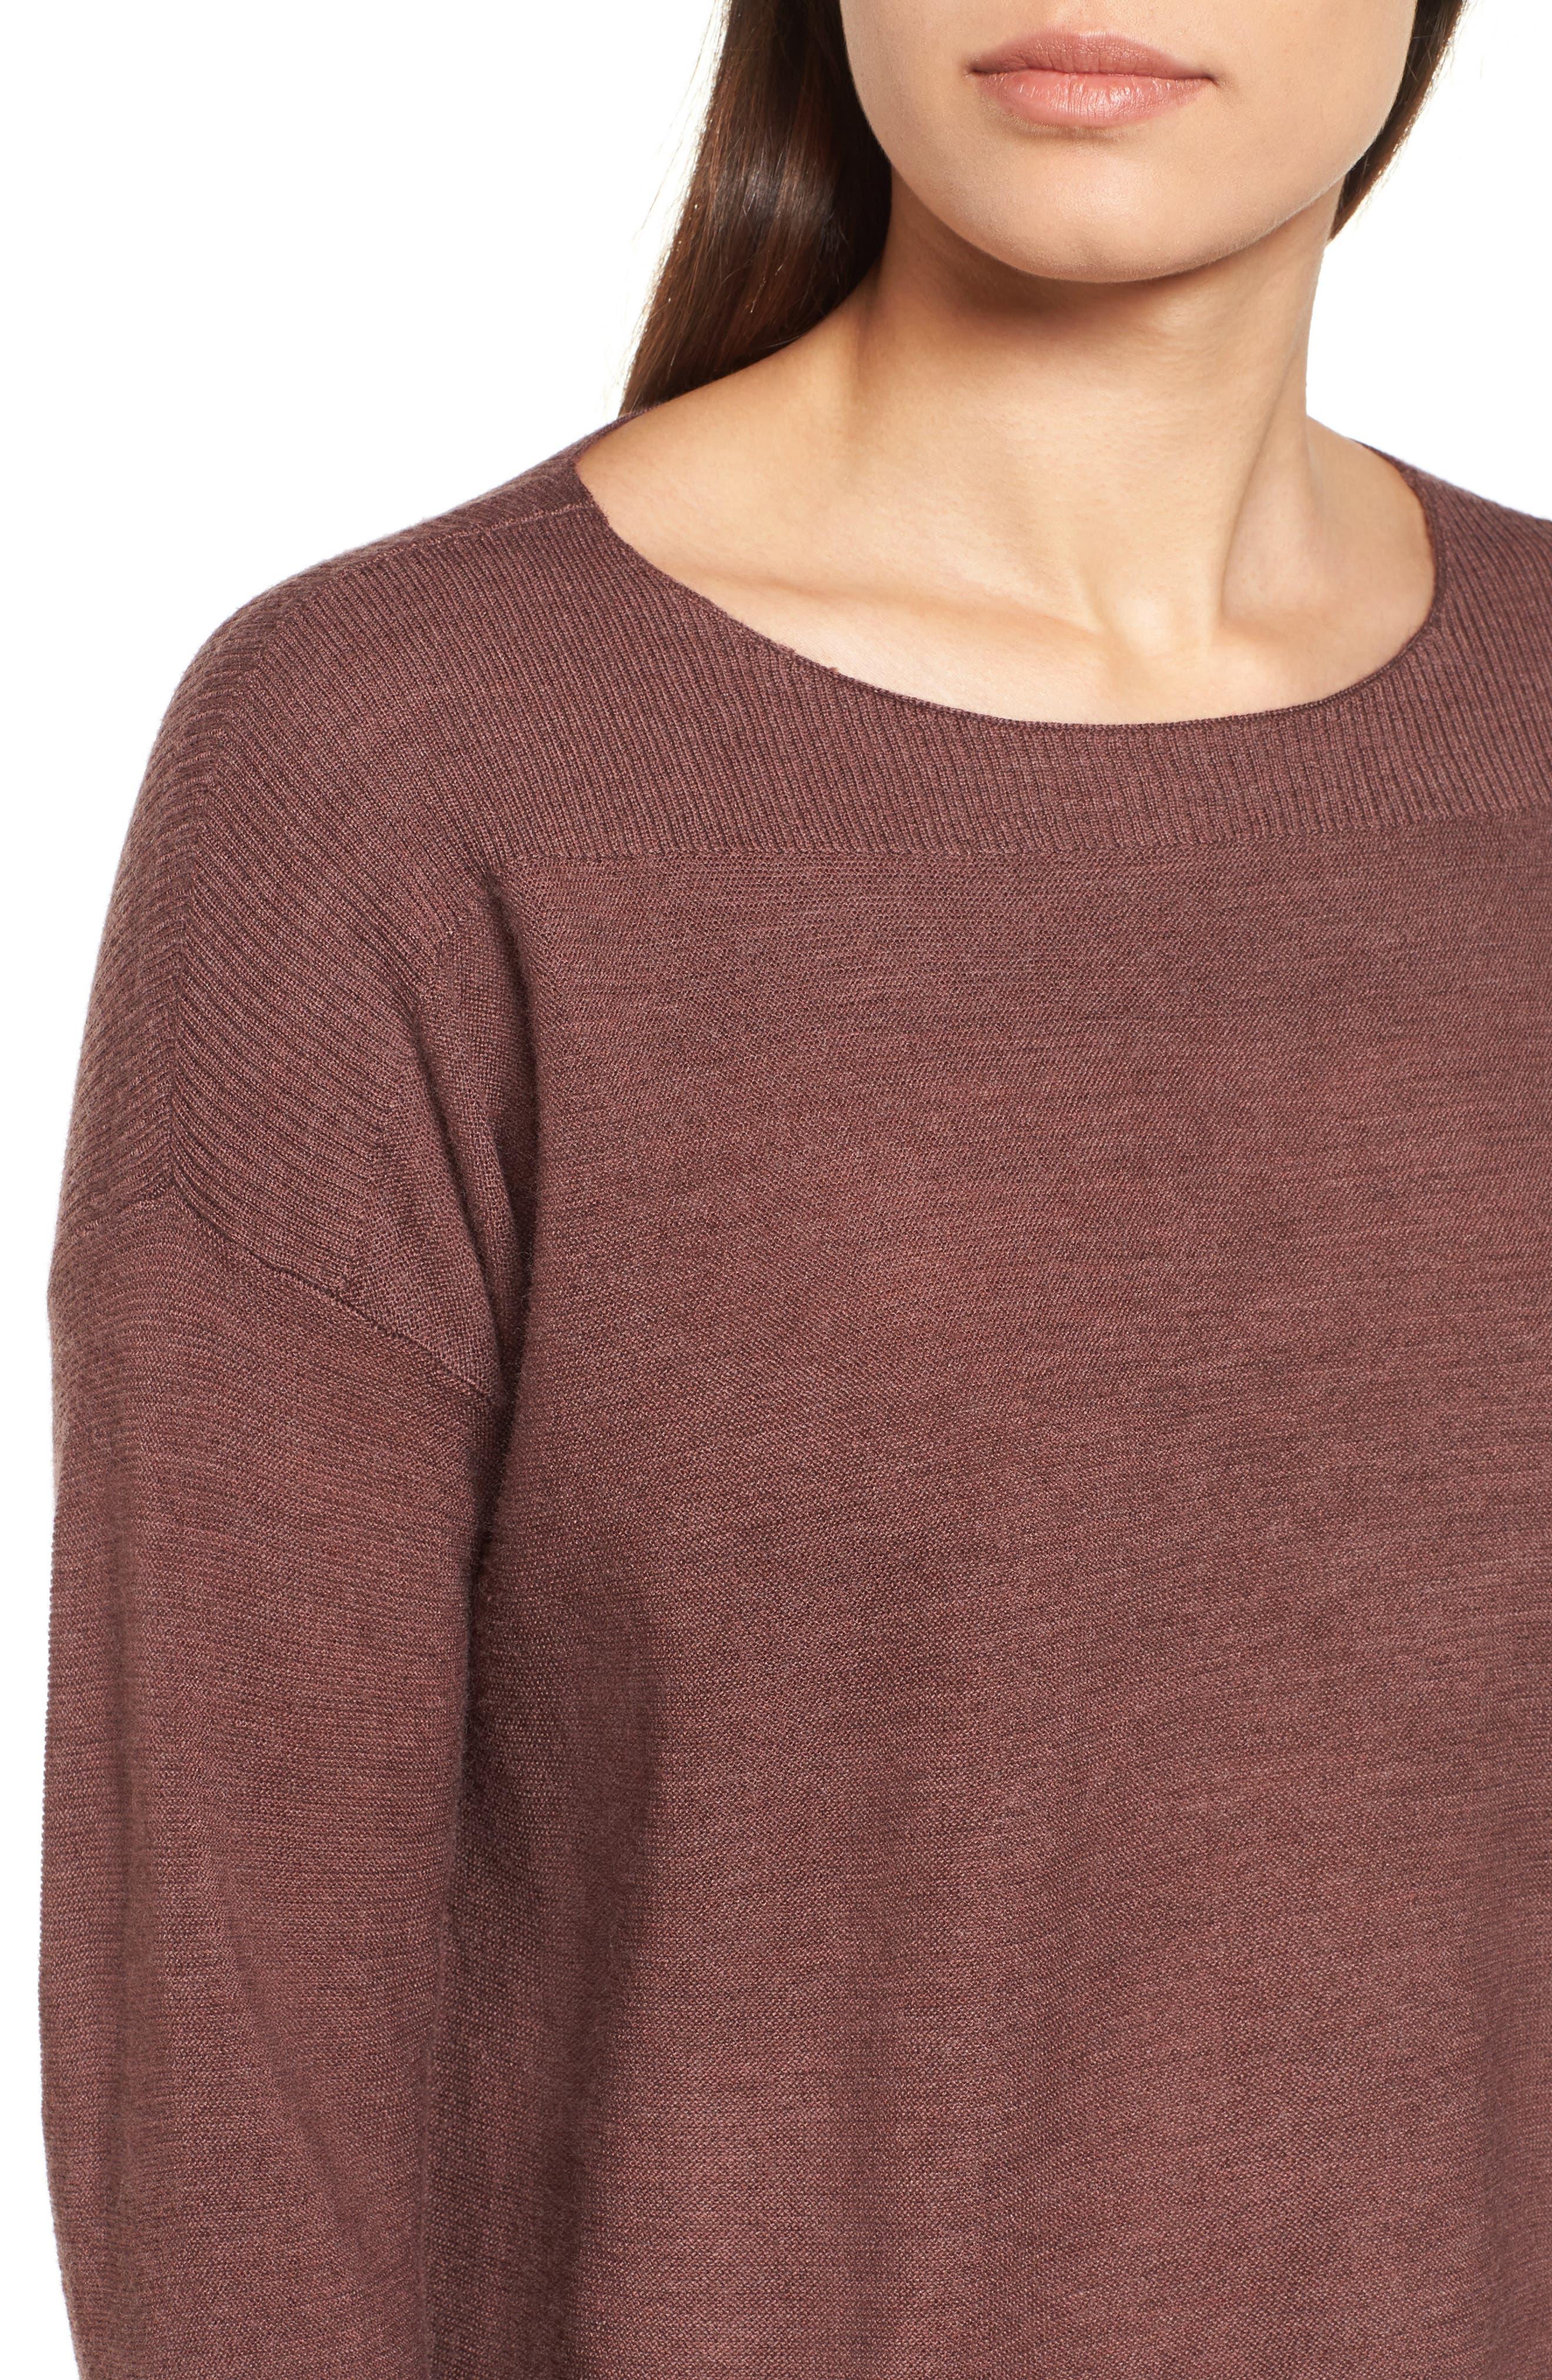 Mix Stitch Merino Bateau Neck Sweater,                             Alternate thumbnail 4, color,                             216